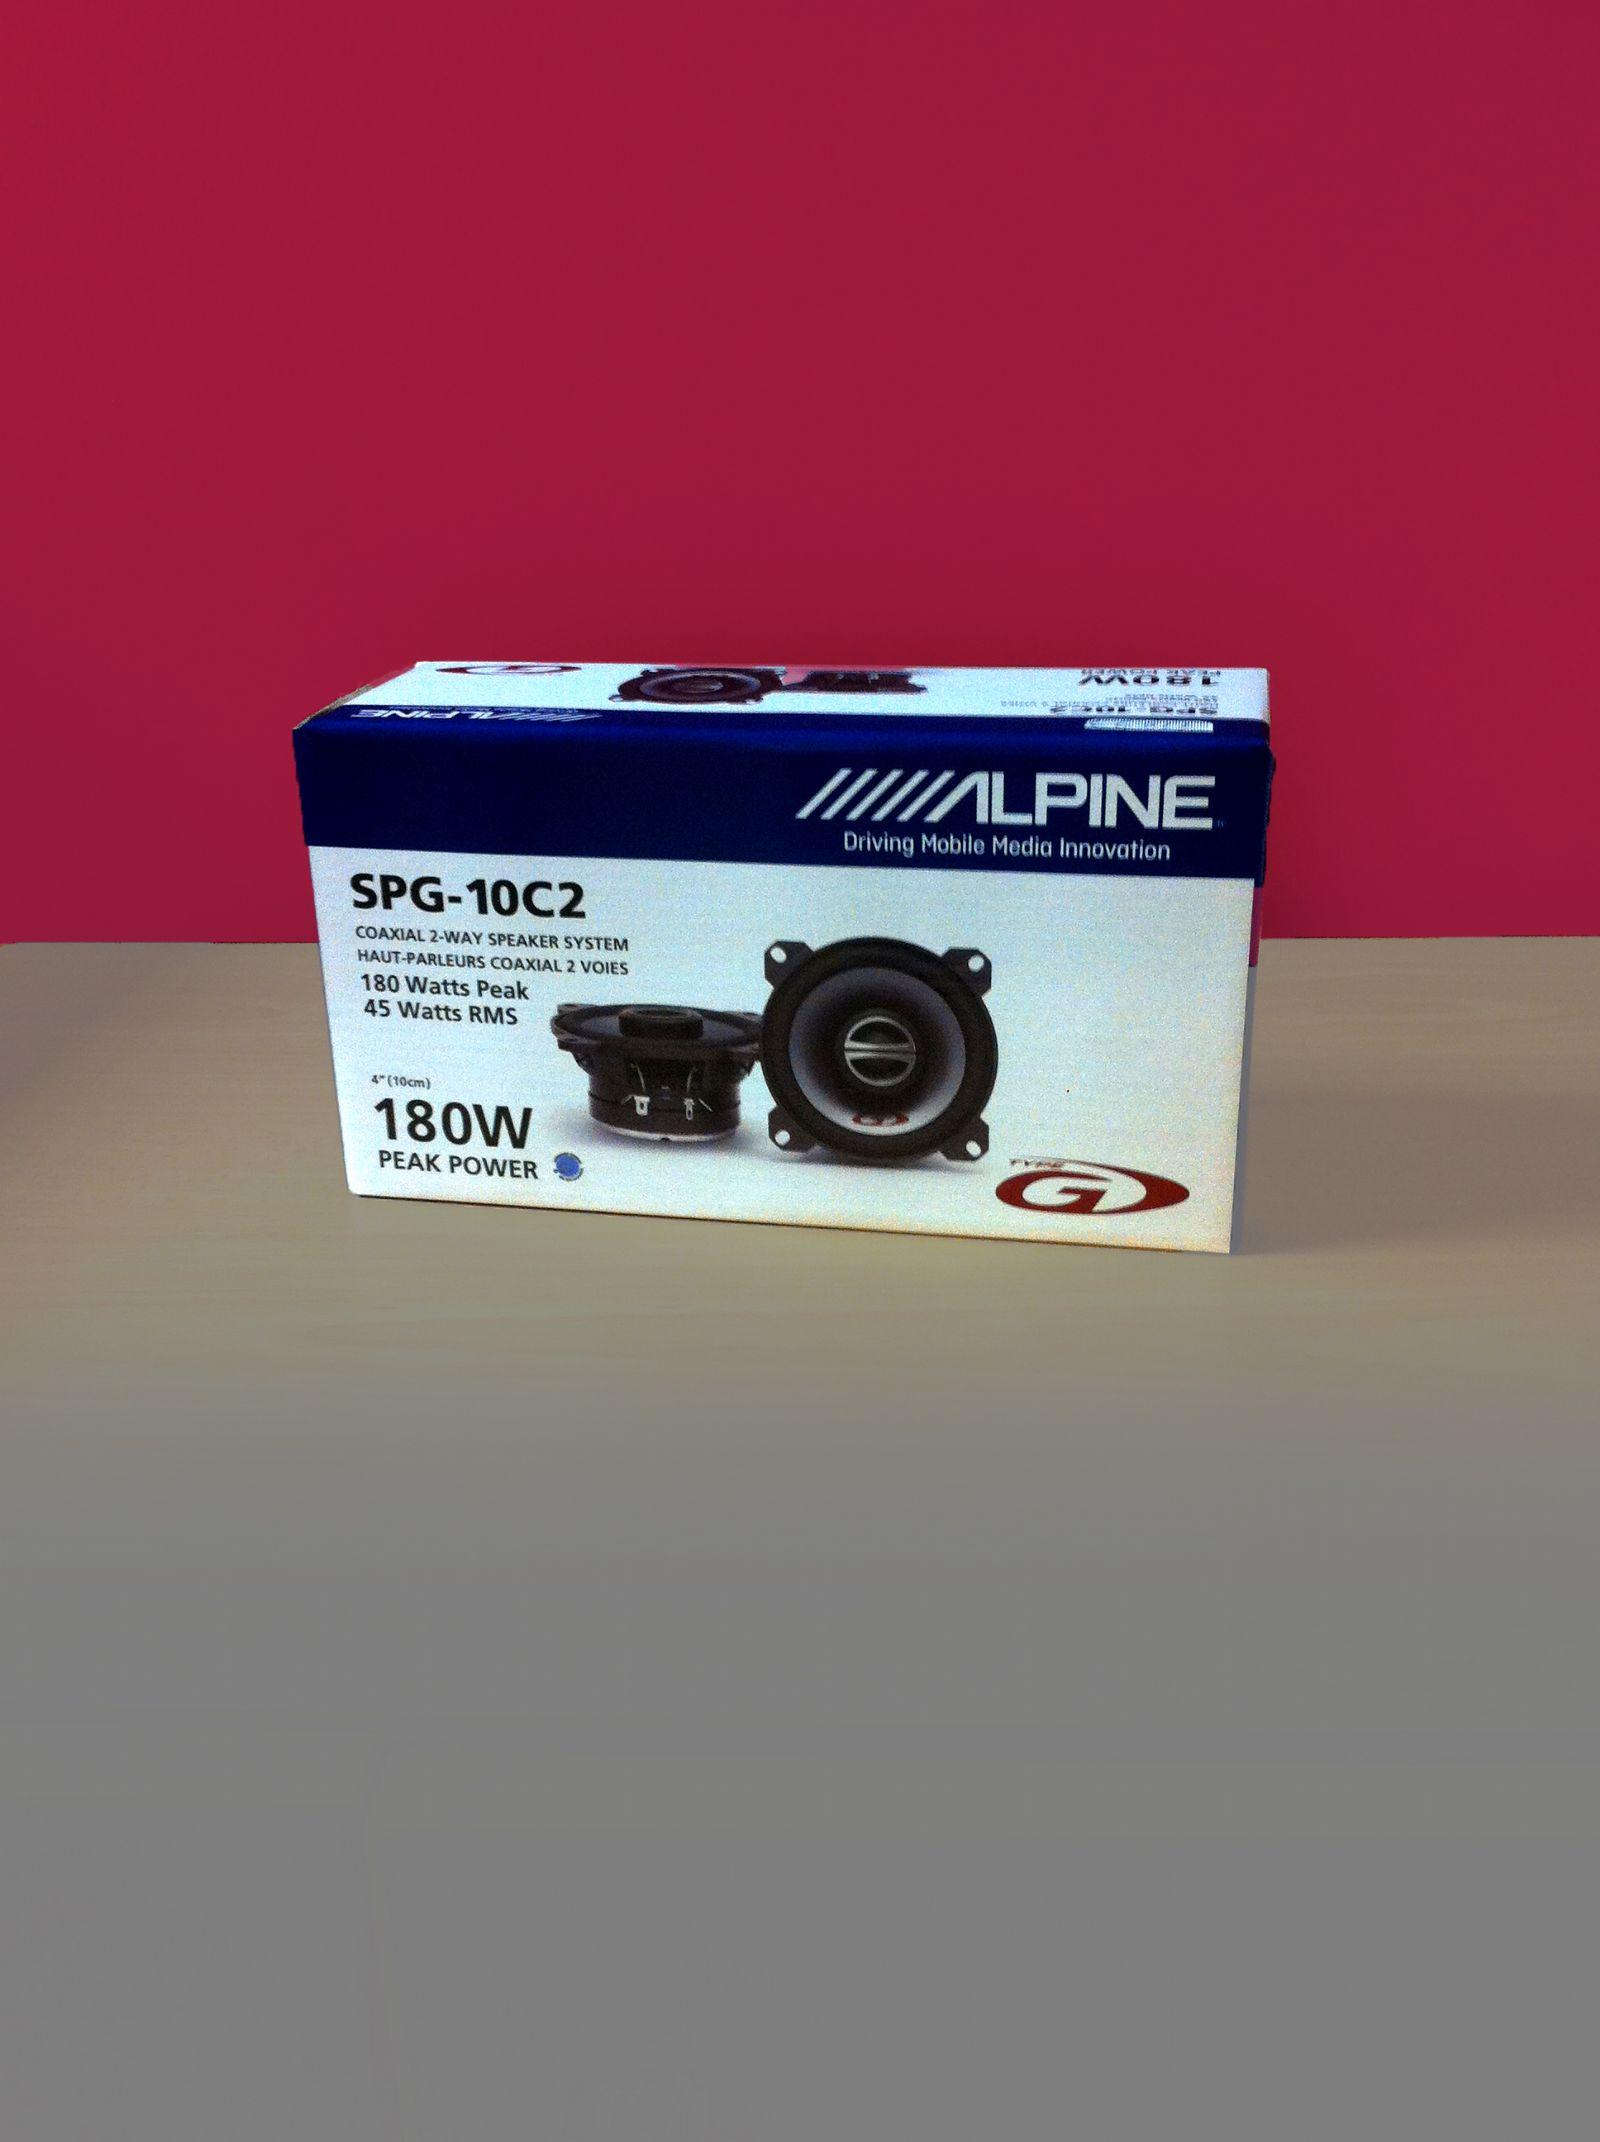 alpine_spg-10c2.JPG